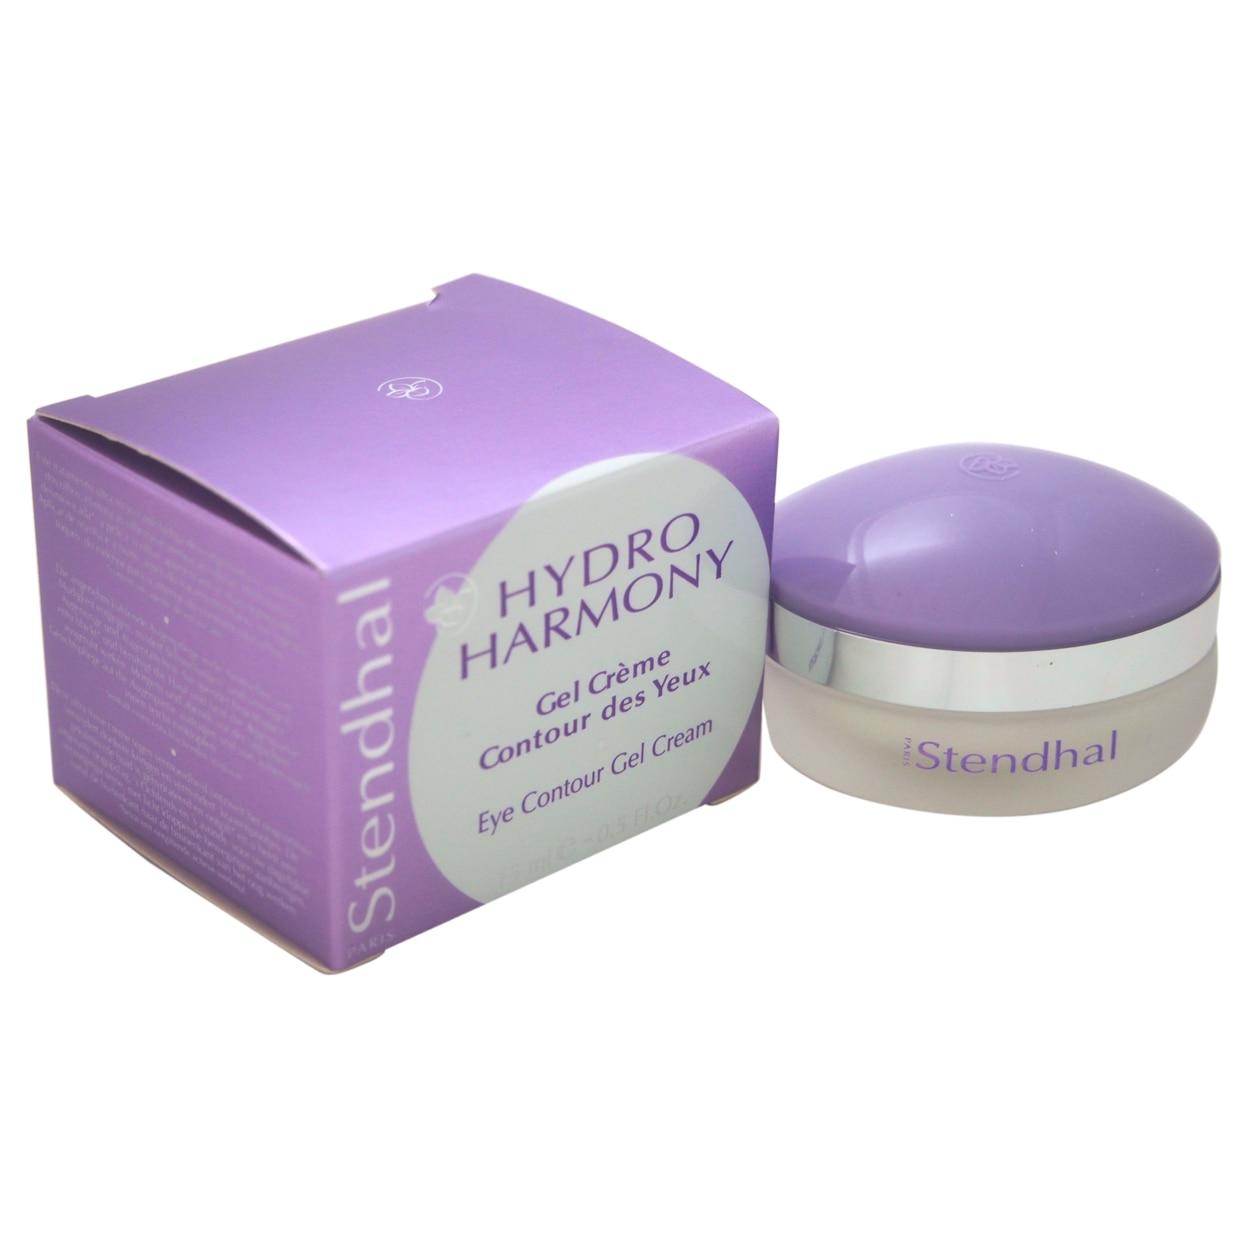 Hydro Harmony Eye Contour Gel Cream by Stendhal for Women - 0.5 oz Gel sisley eye and lip contour cream